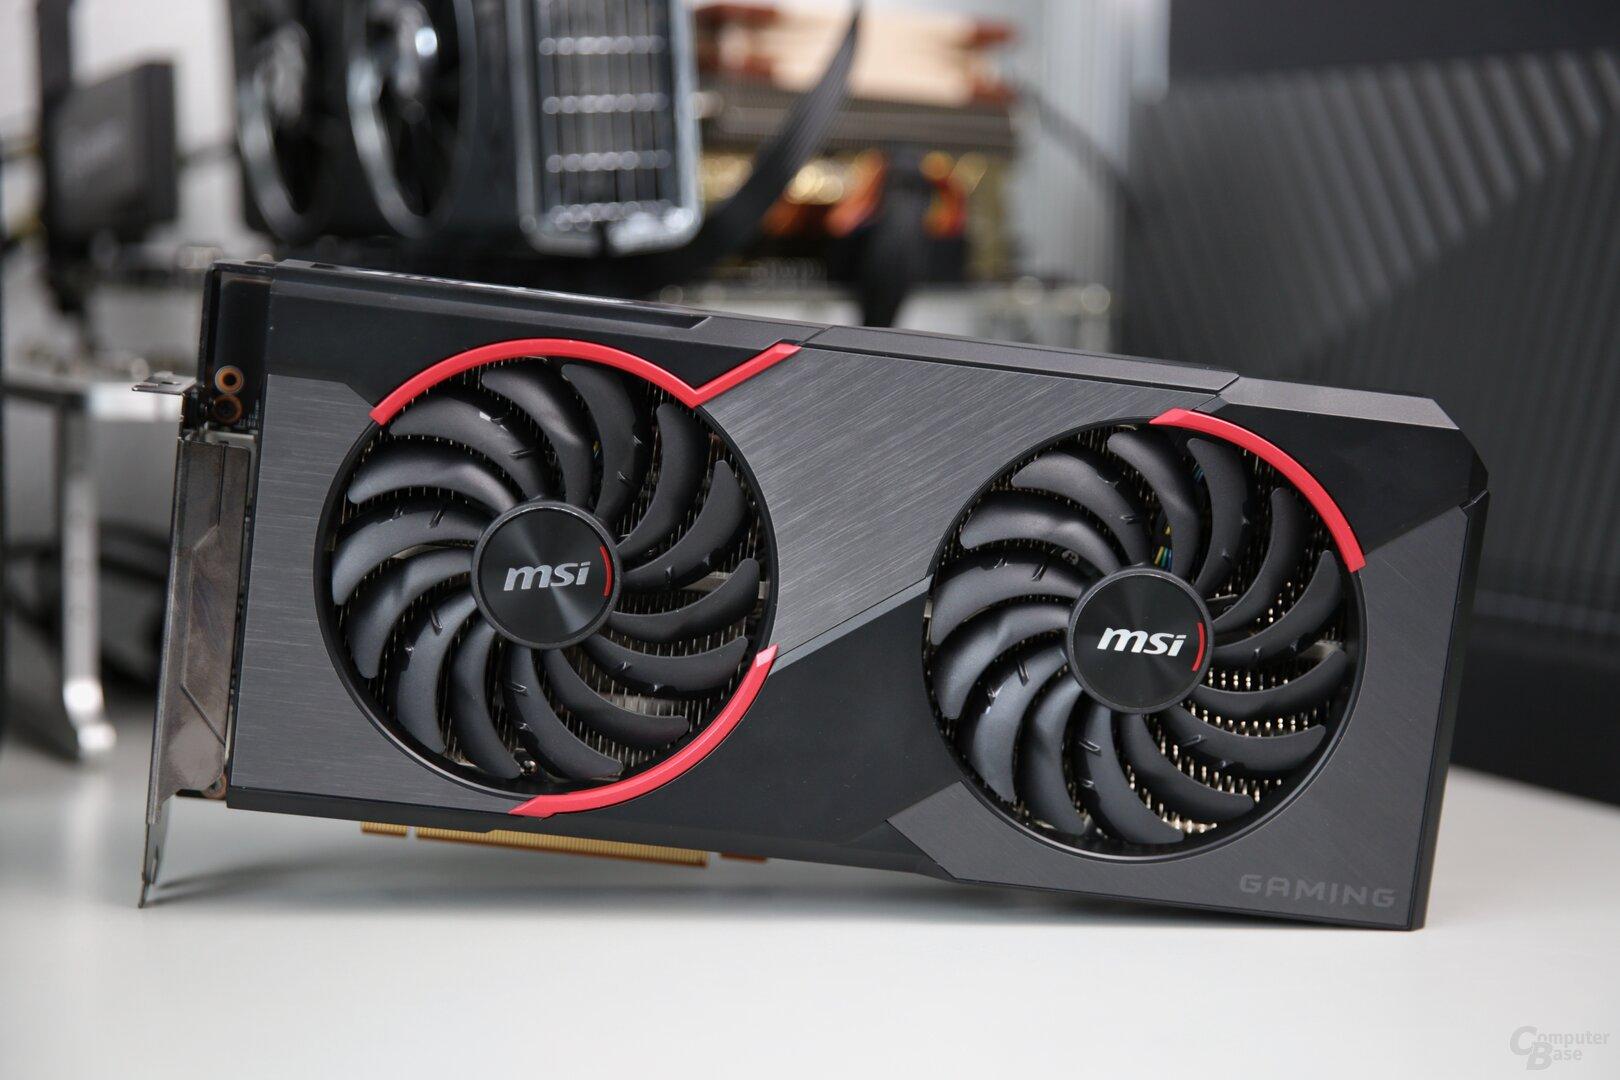 Die MSI Radeon RX 5700 XT Gaming X im Test